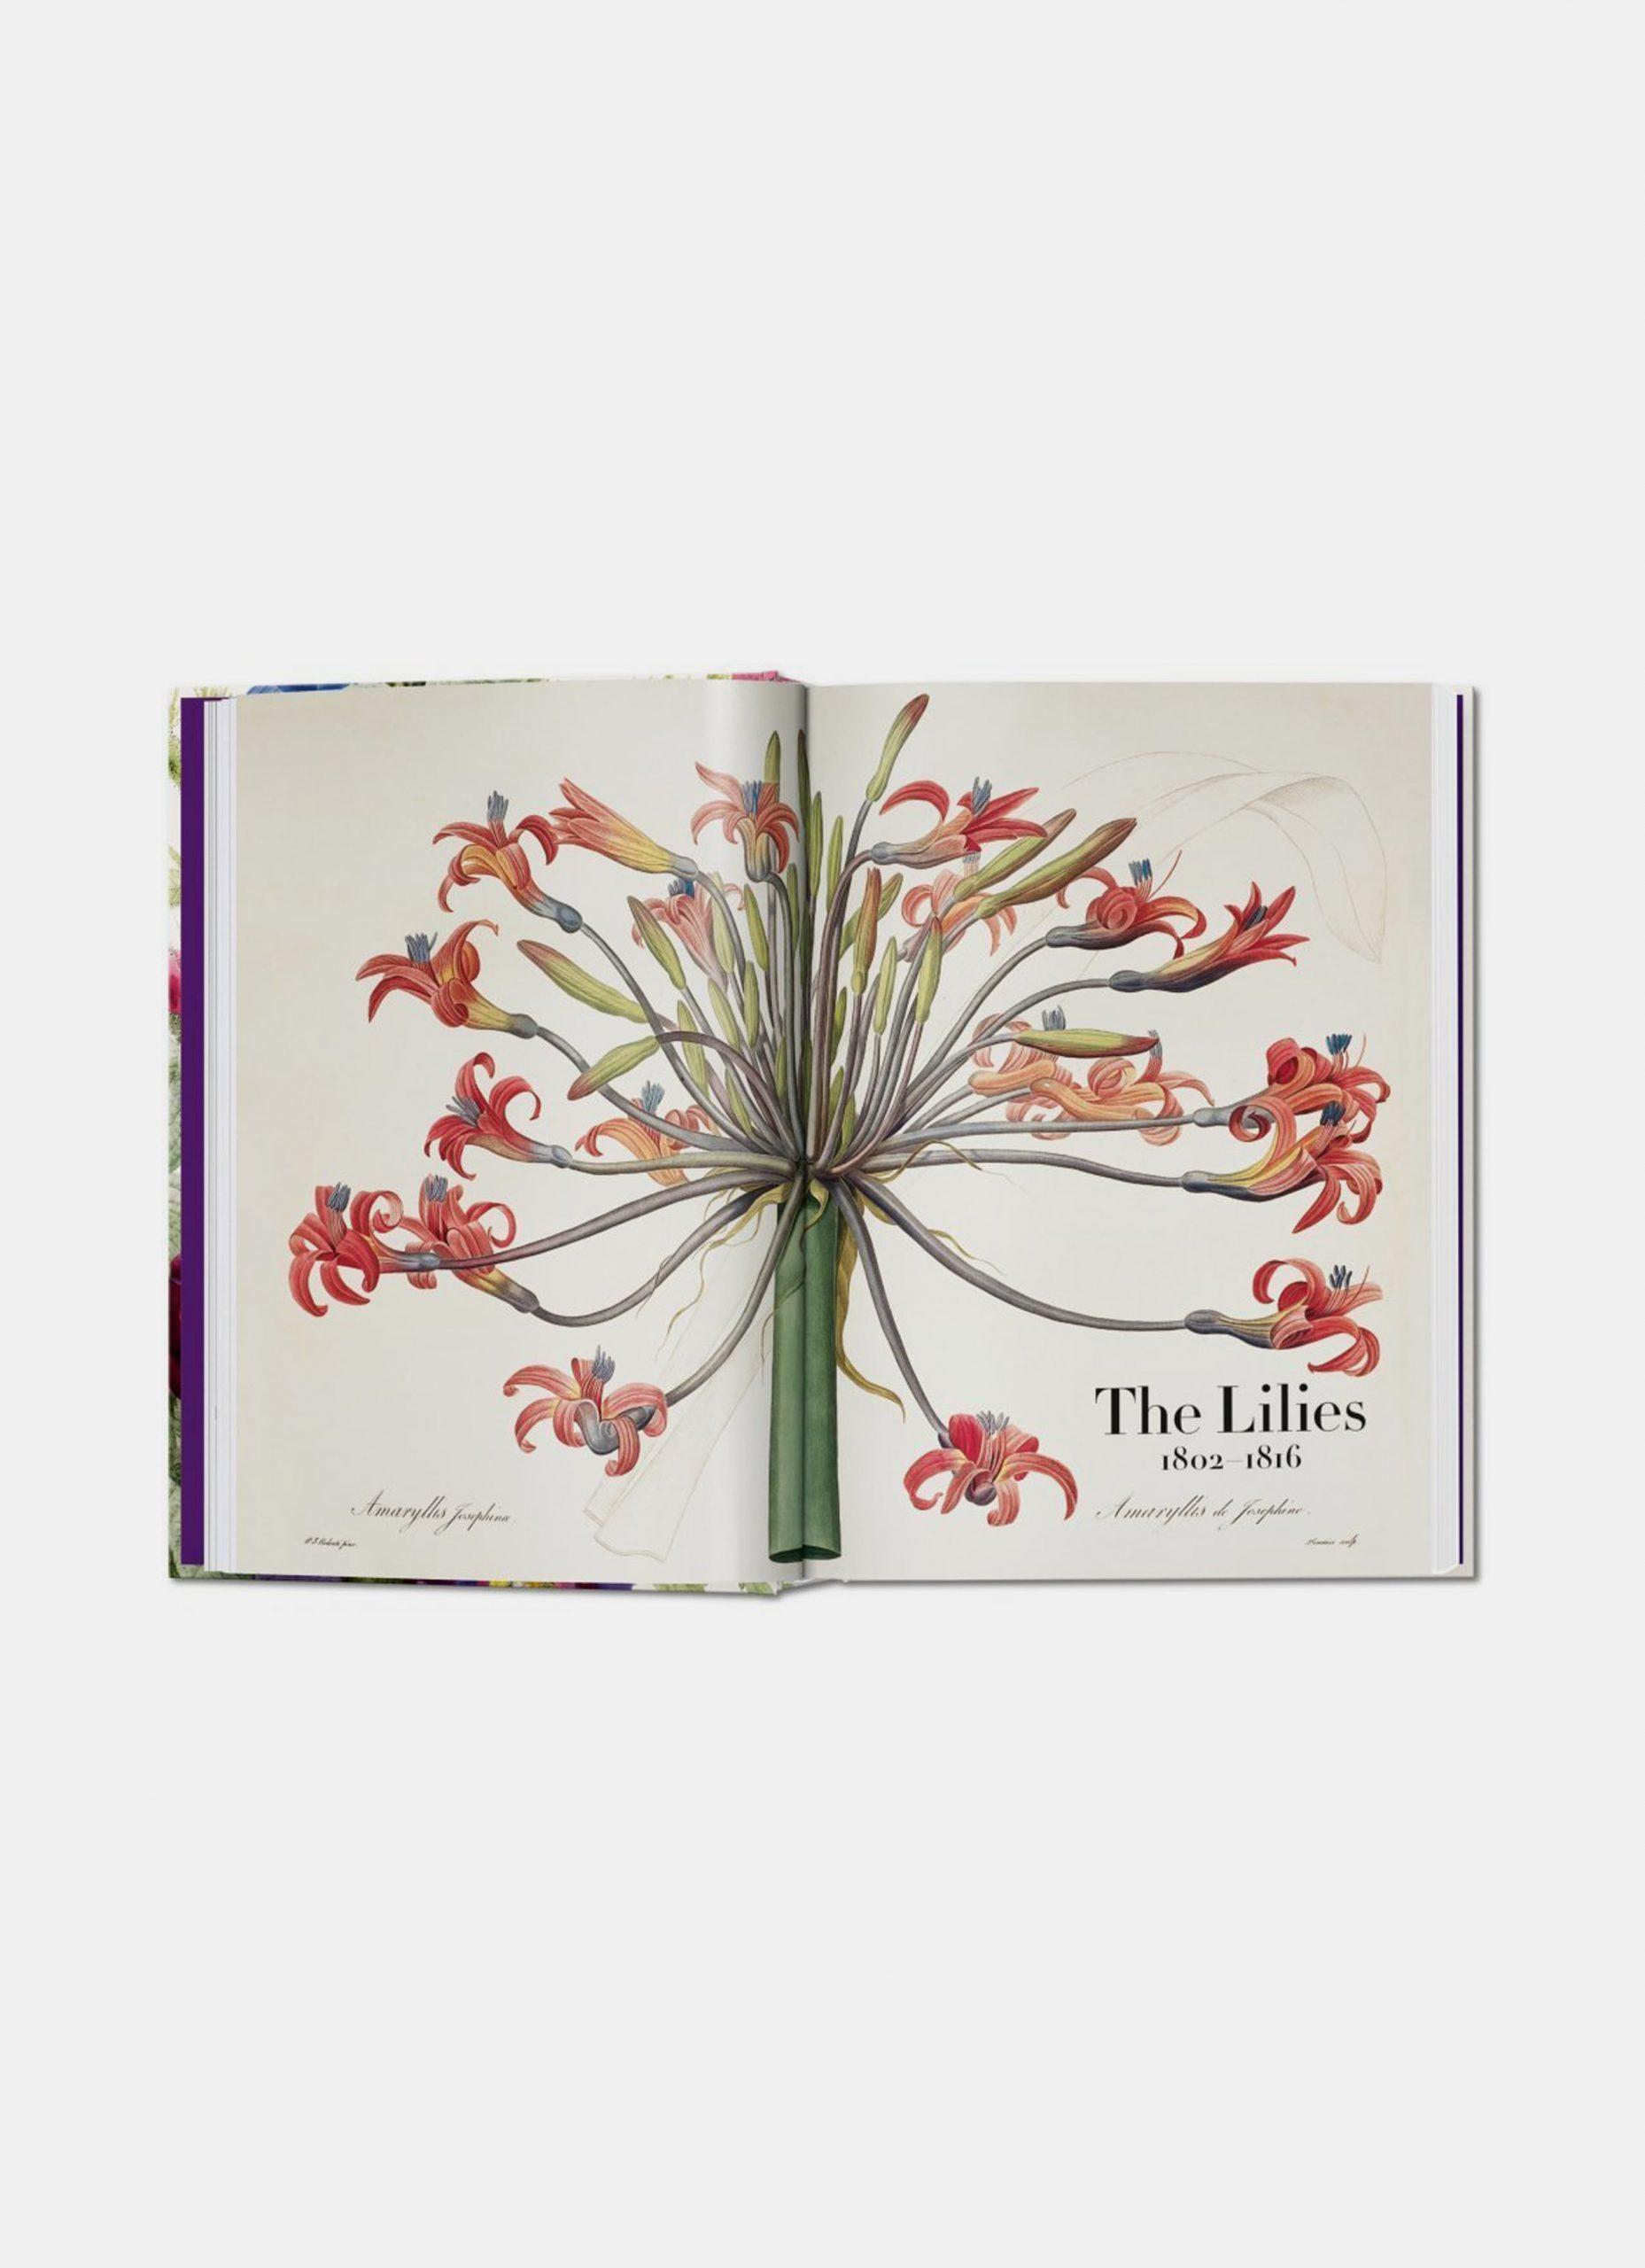 Taschen - Pierre-Joseph Redouté - The Book of Flowers - 40th Anniversary Edition